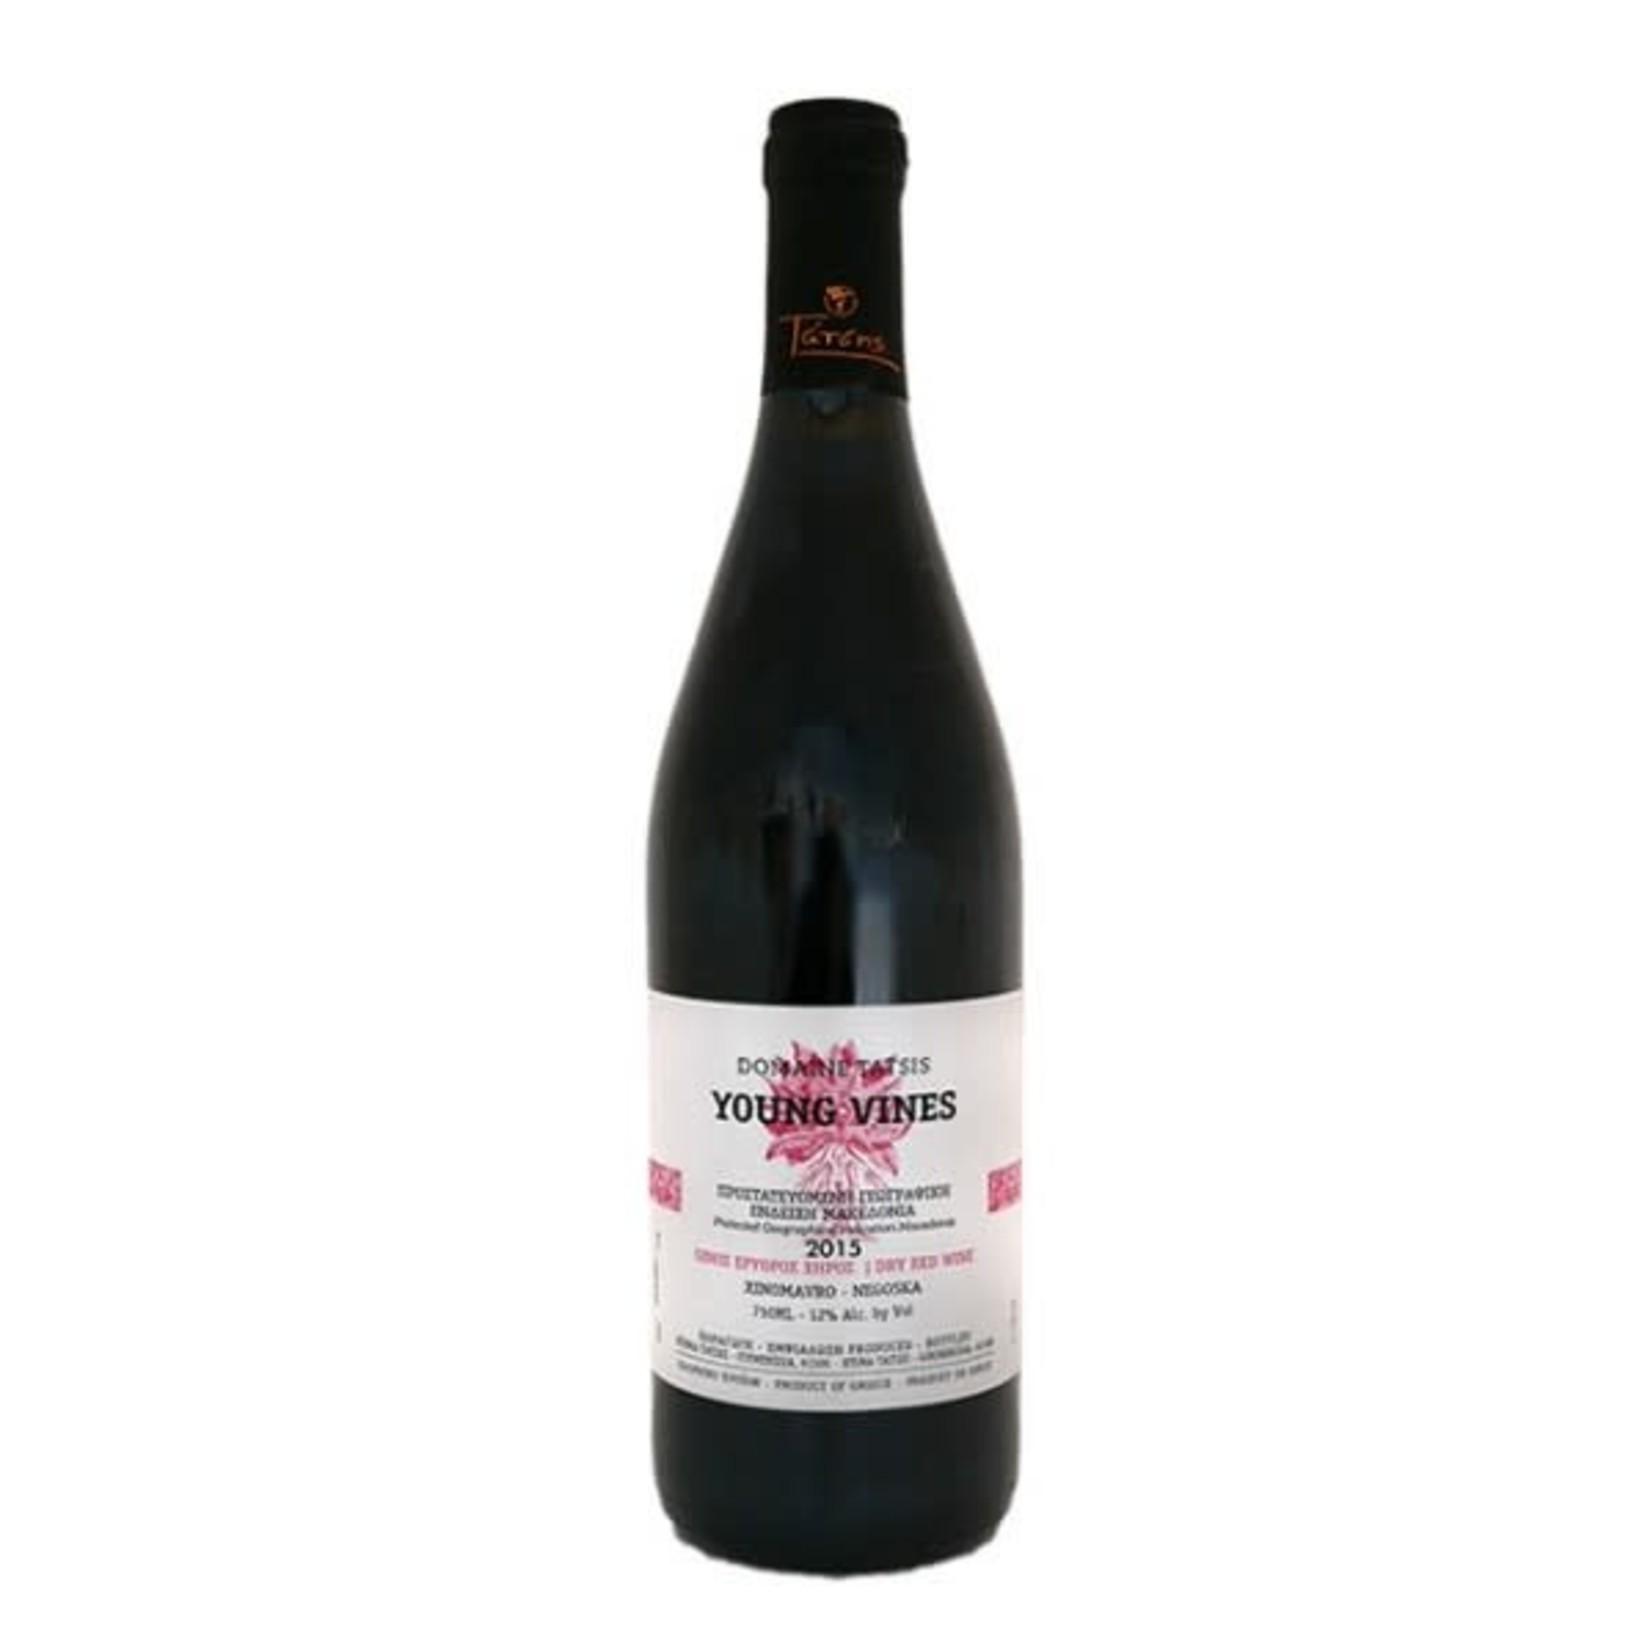 2015 Domaine Tatsis Young Vines